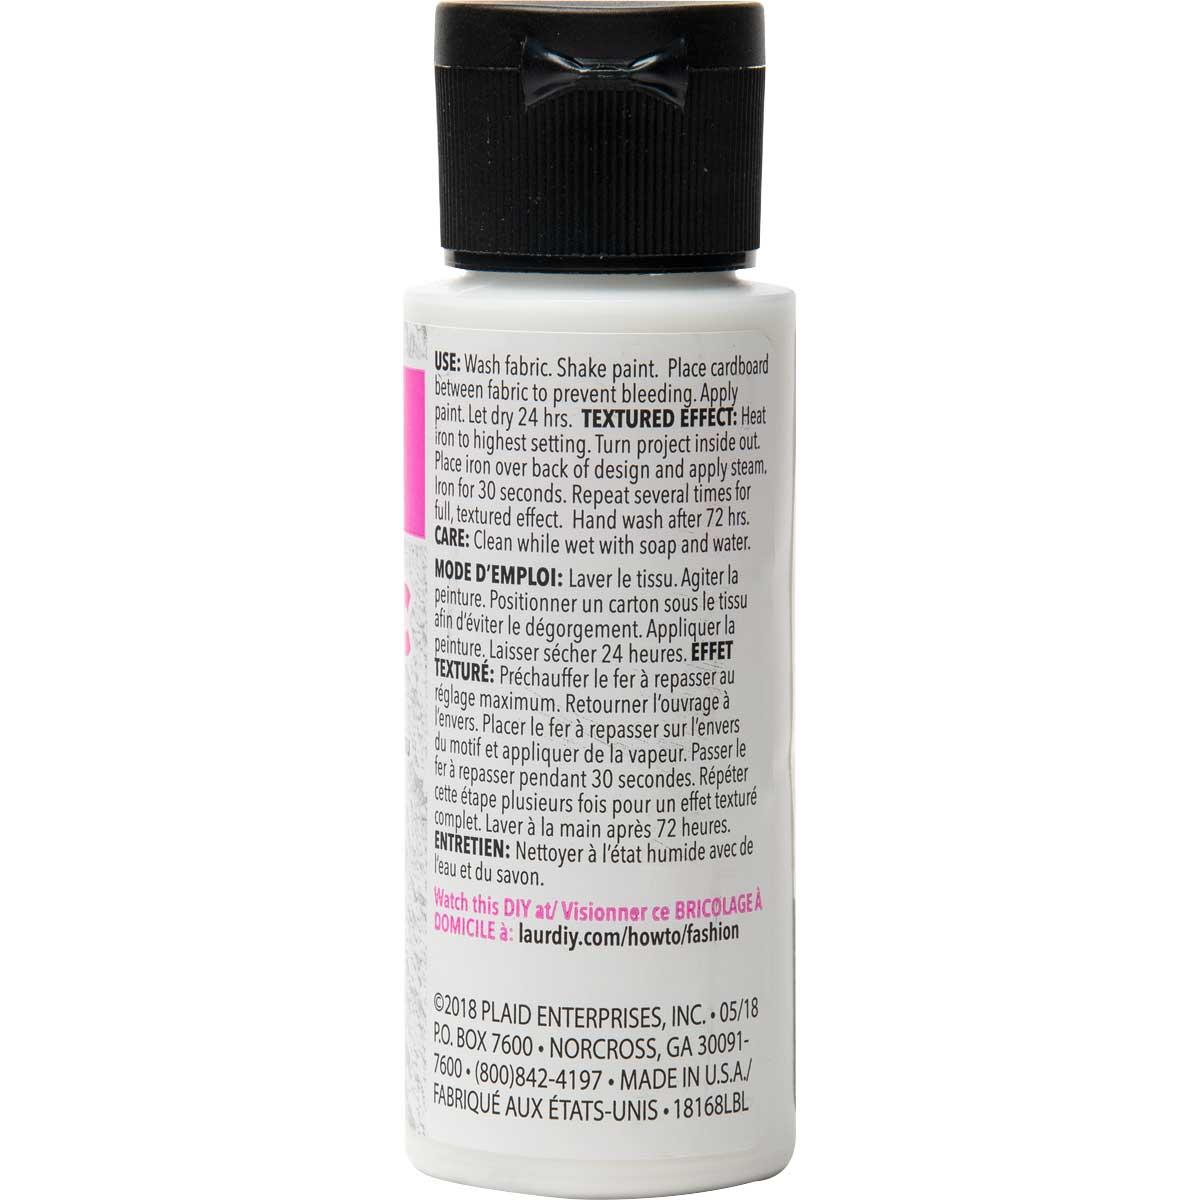 LaurDIY ® Texturific™ Fabric Paint - BearBear,2 oz.